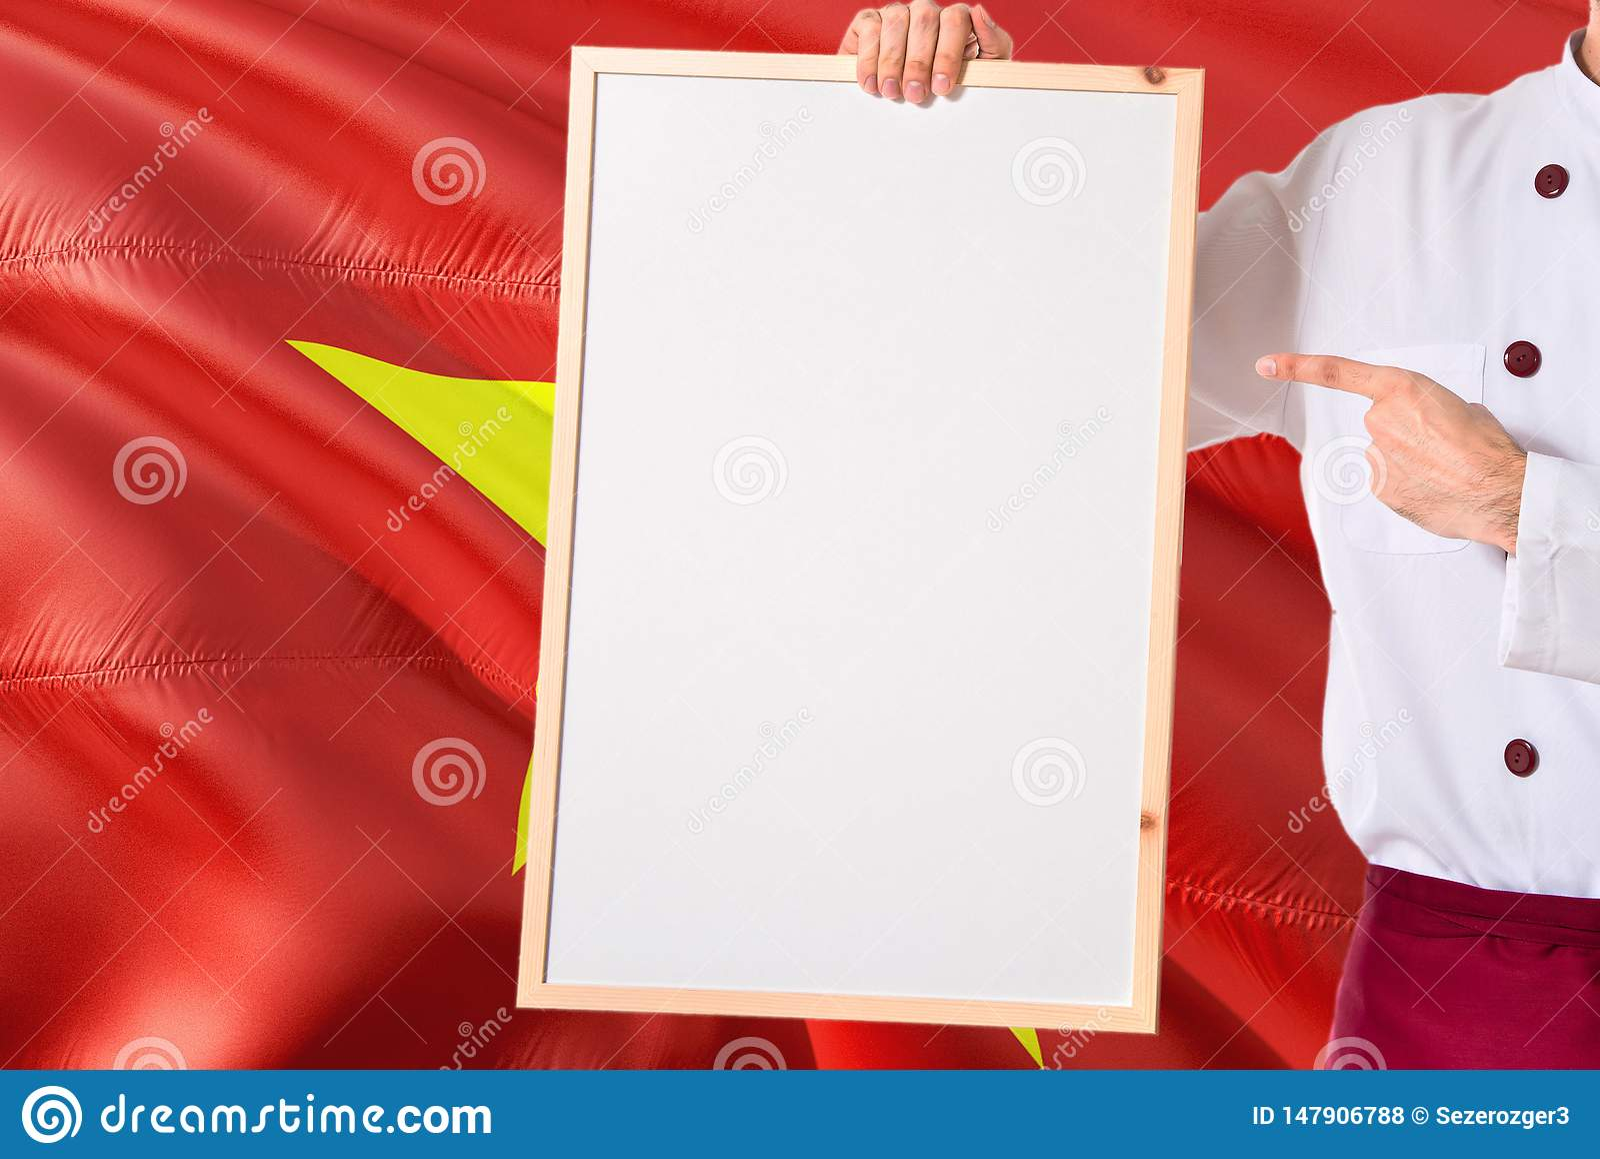 Vietnamese Chef Holding Blank Whiteboard Menu On Vietnam